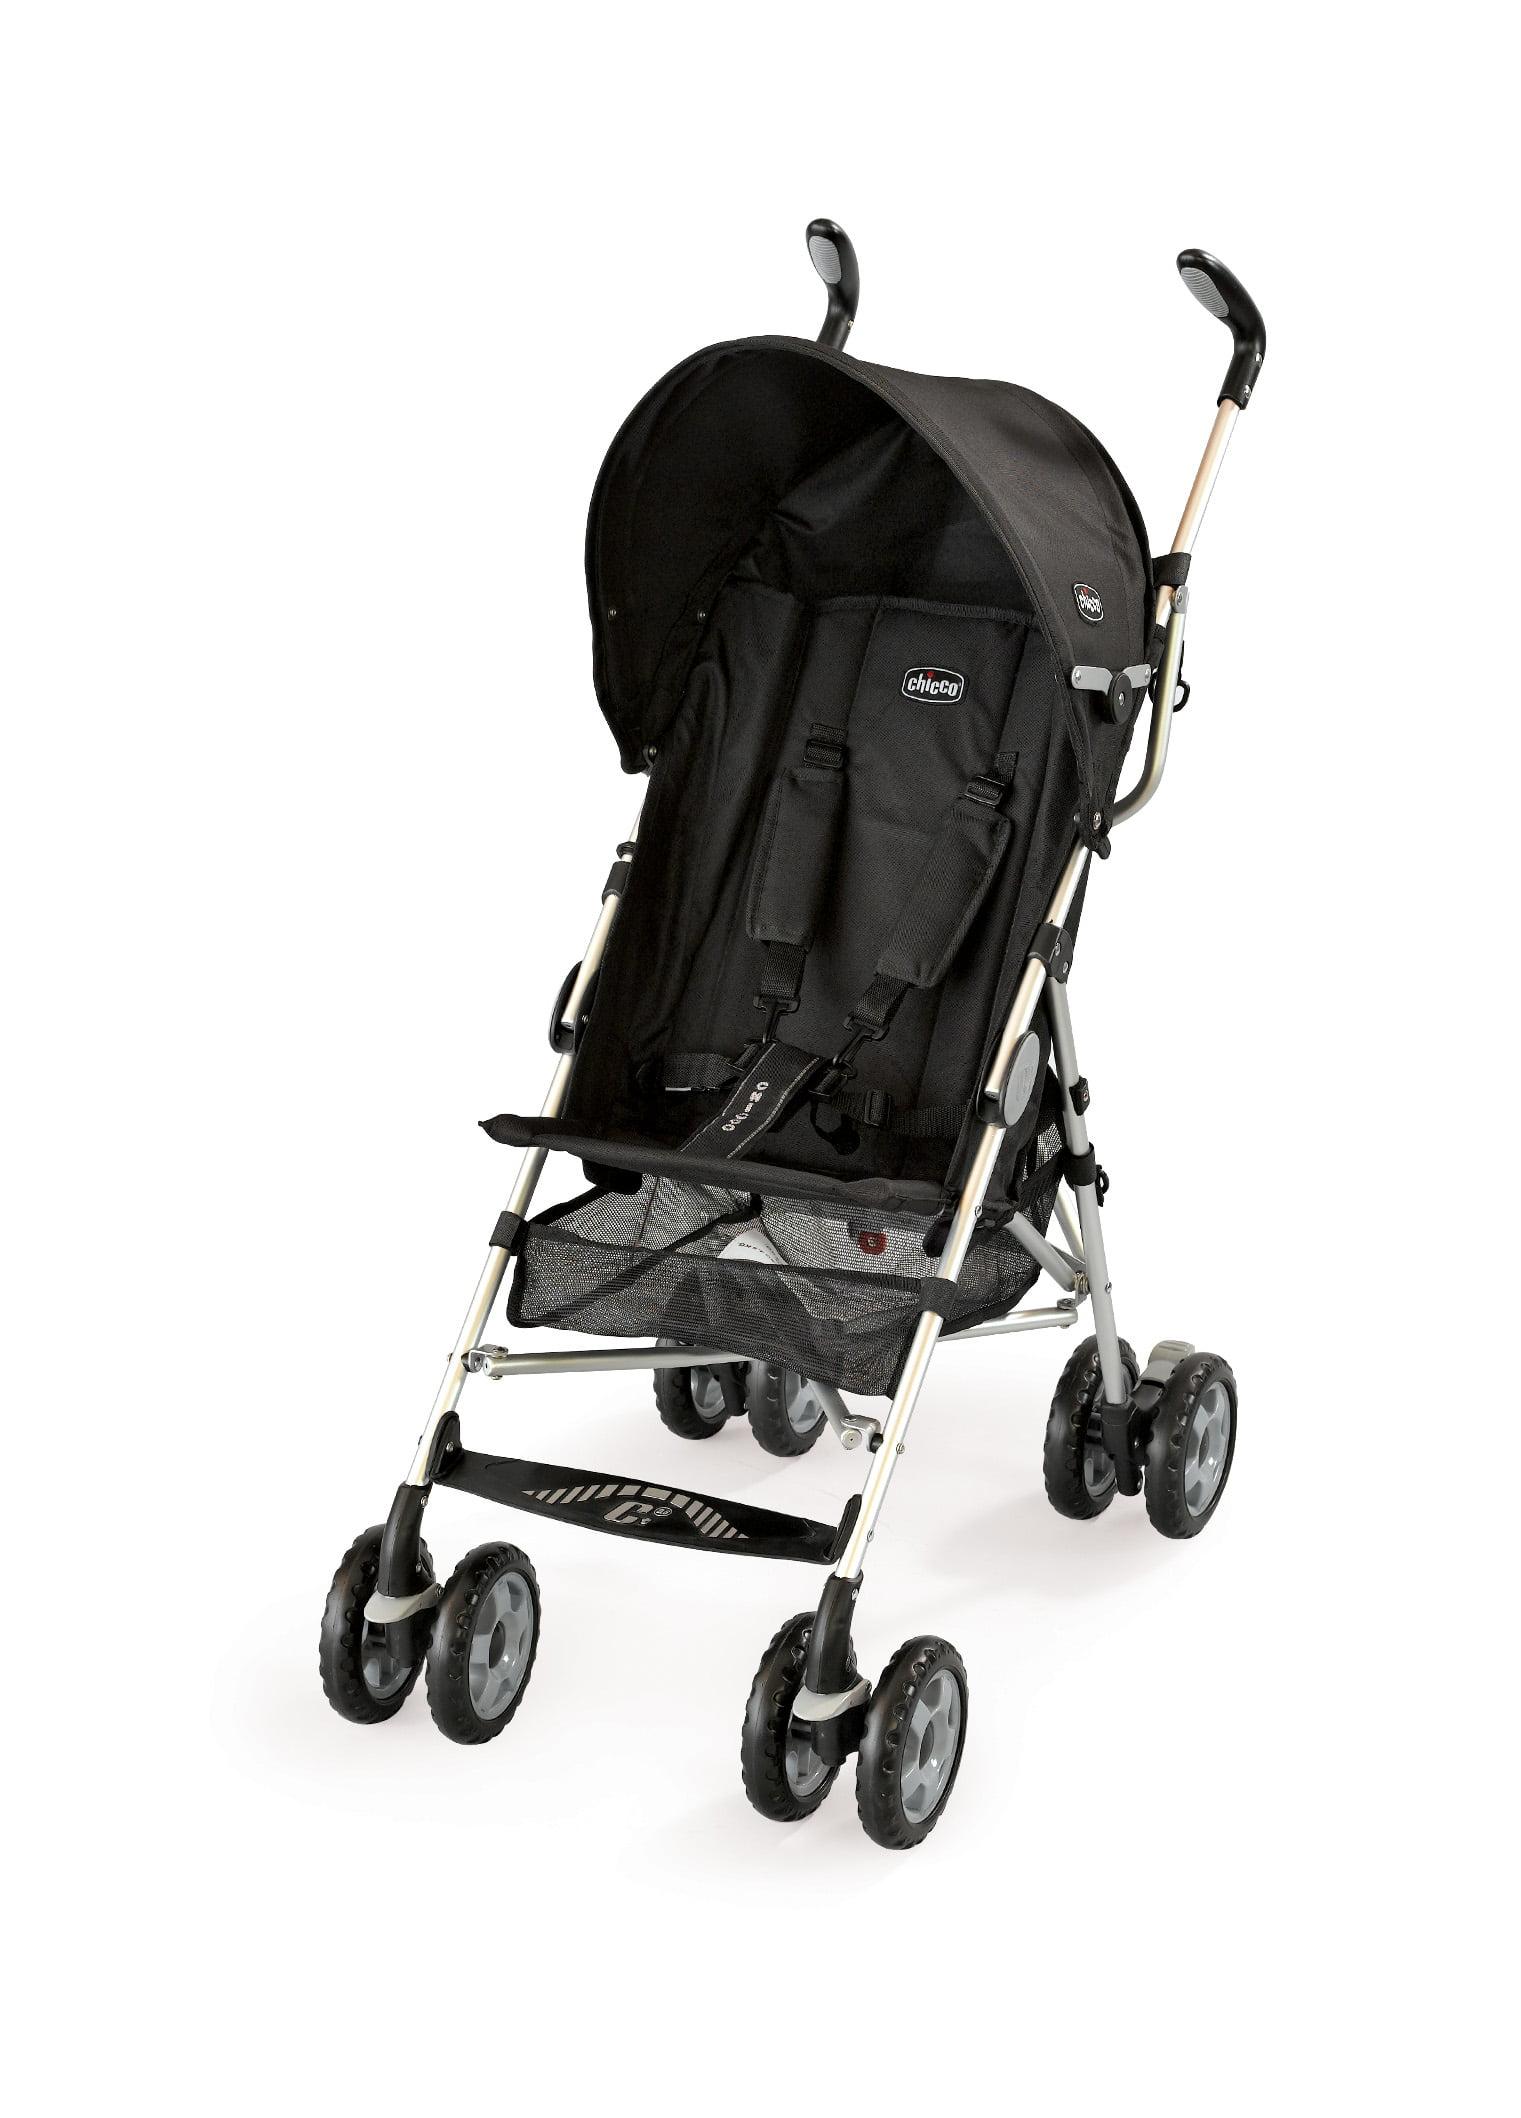 Chicco Capri Lightweight Stroller, Black by Chicco